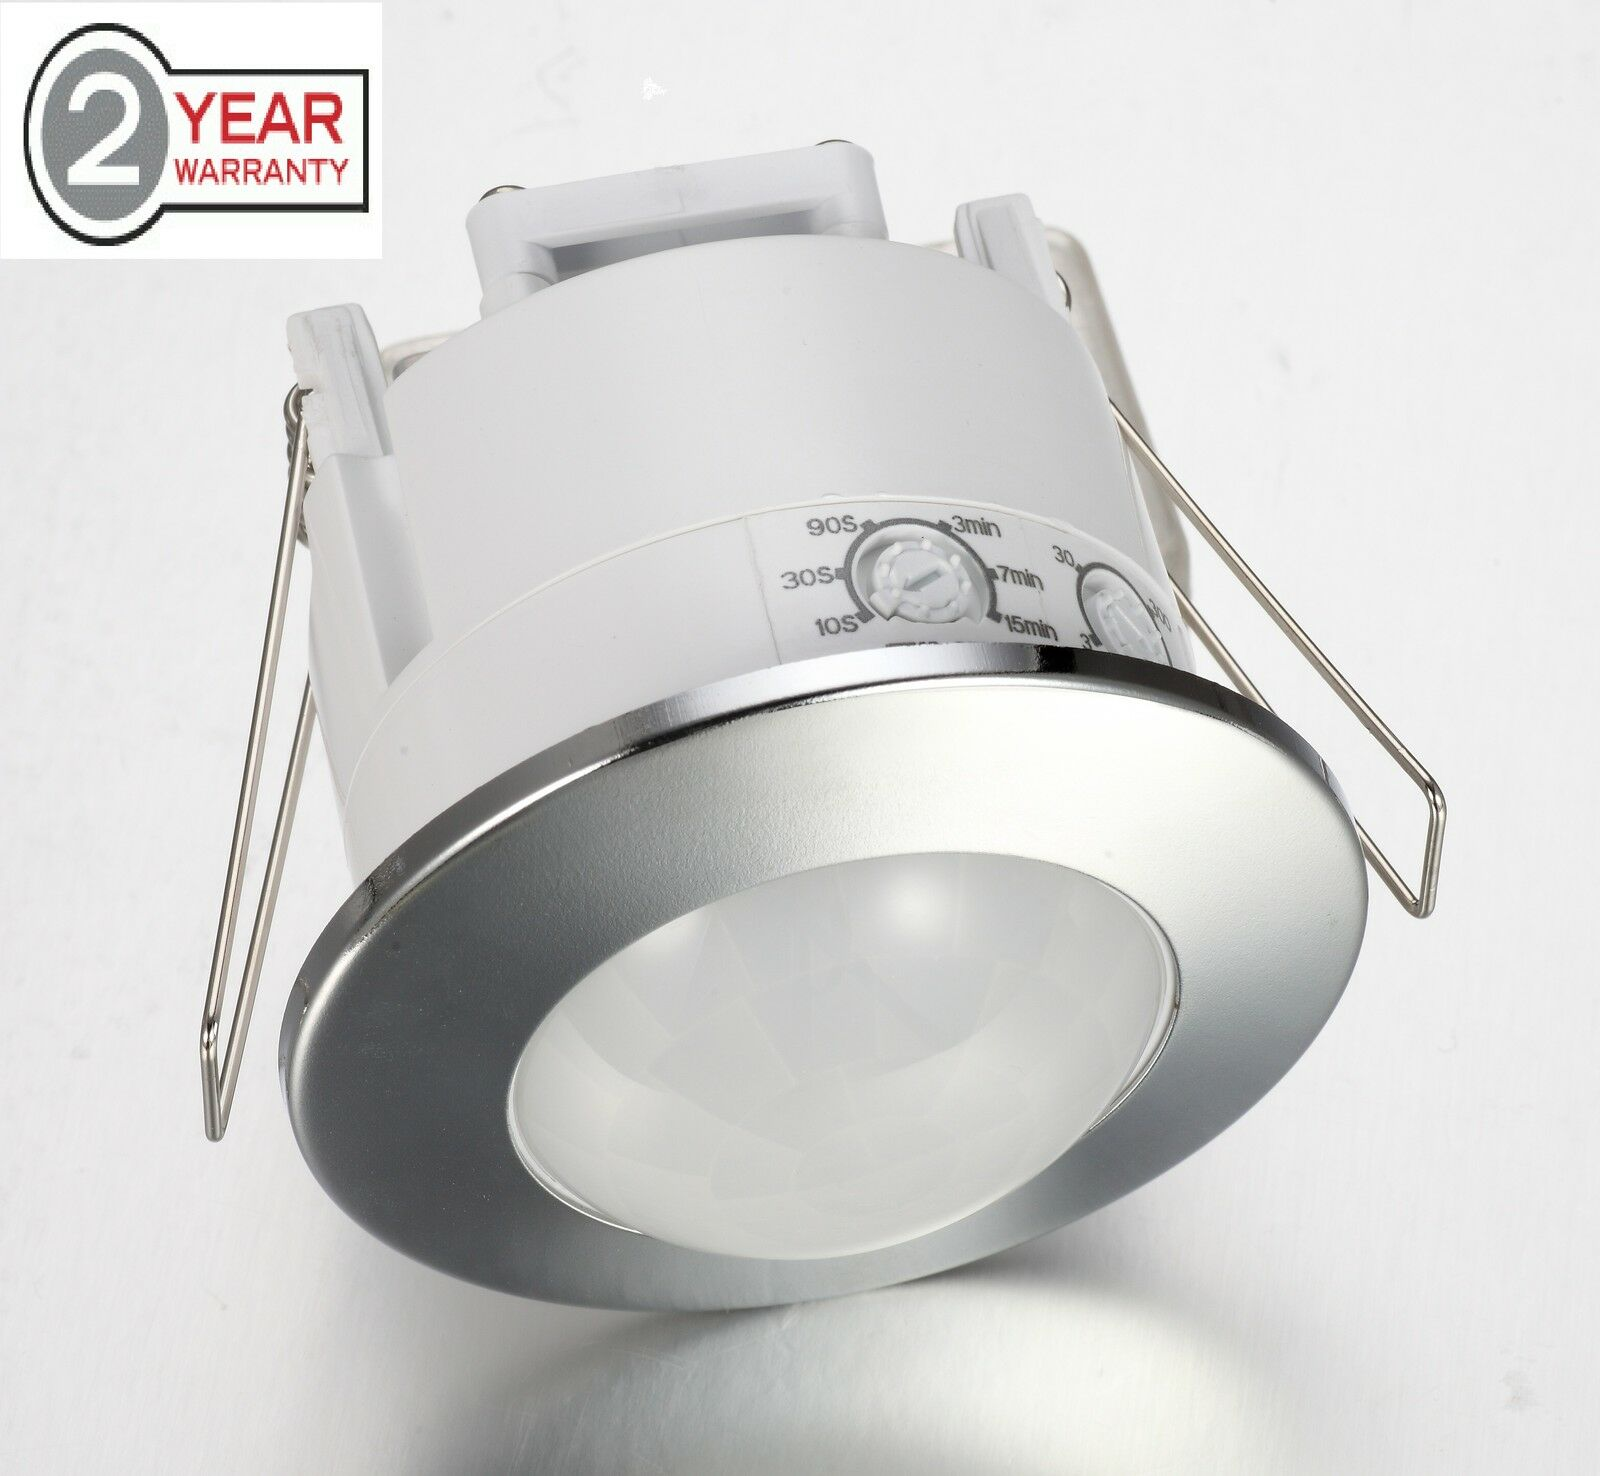 360 Degree Recessed Pir Ceiling Occupancy Motion Sensor